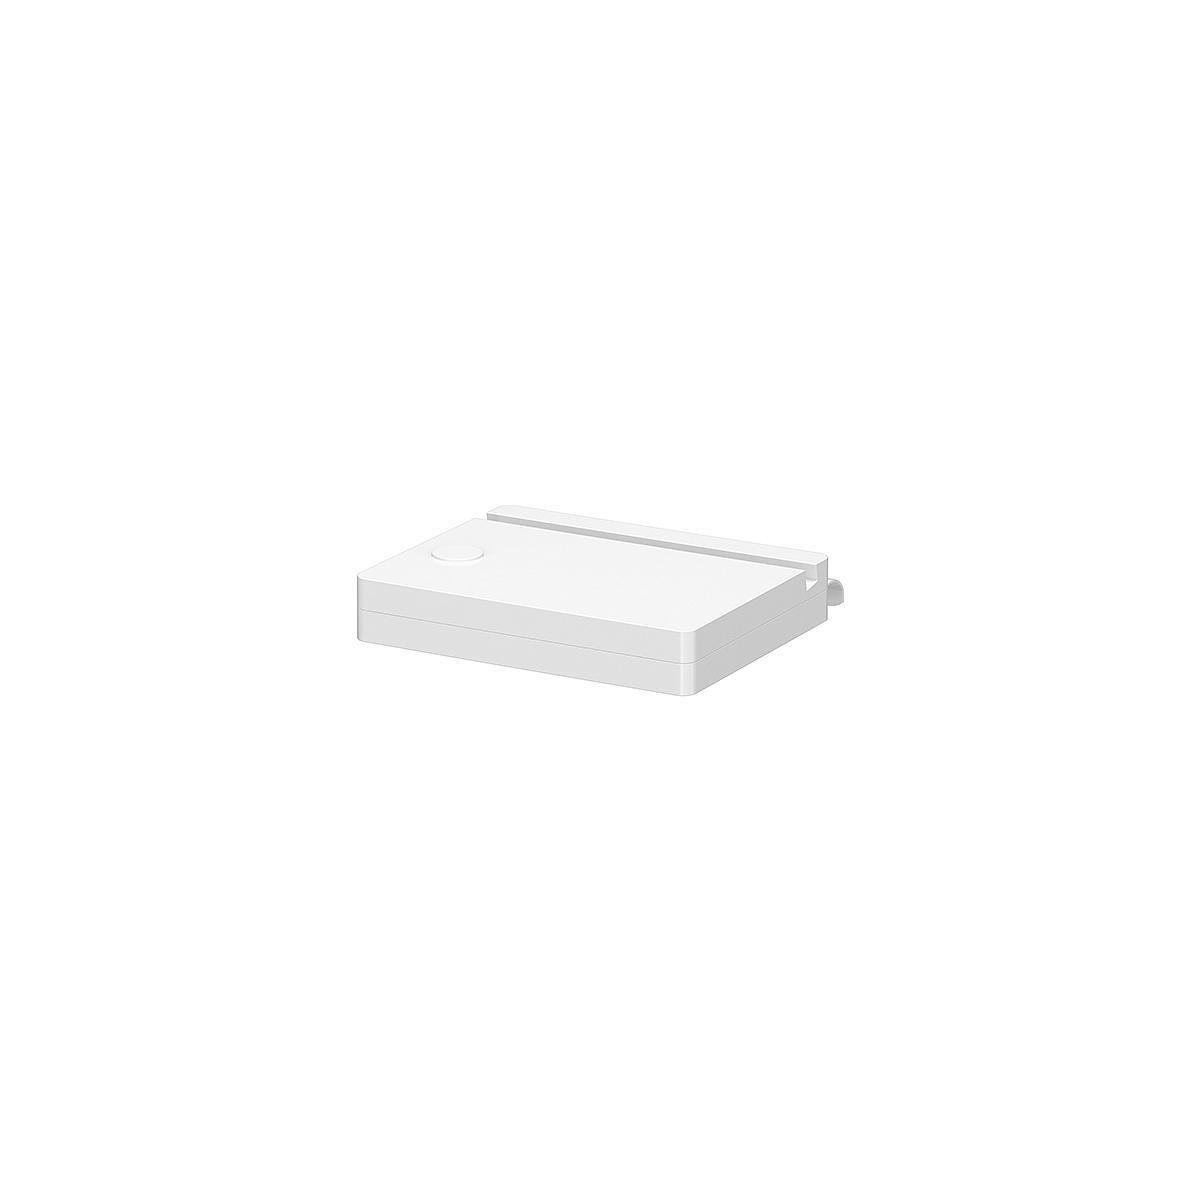 Soporte tablet Camas CLICKON CLASSIC Flexa blanco